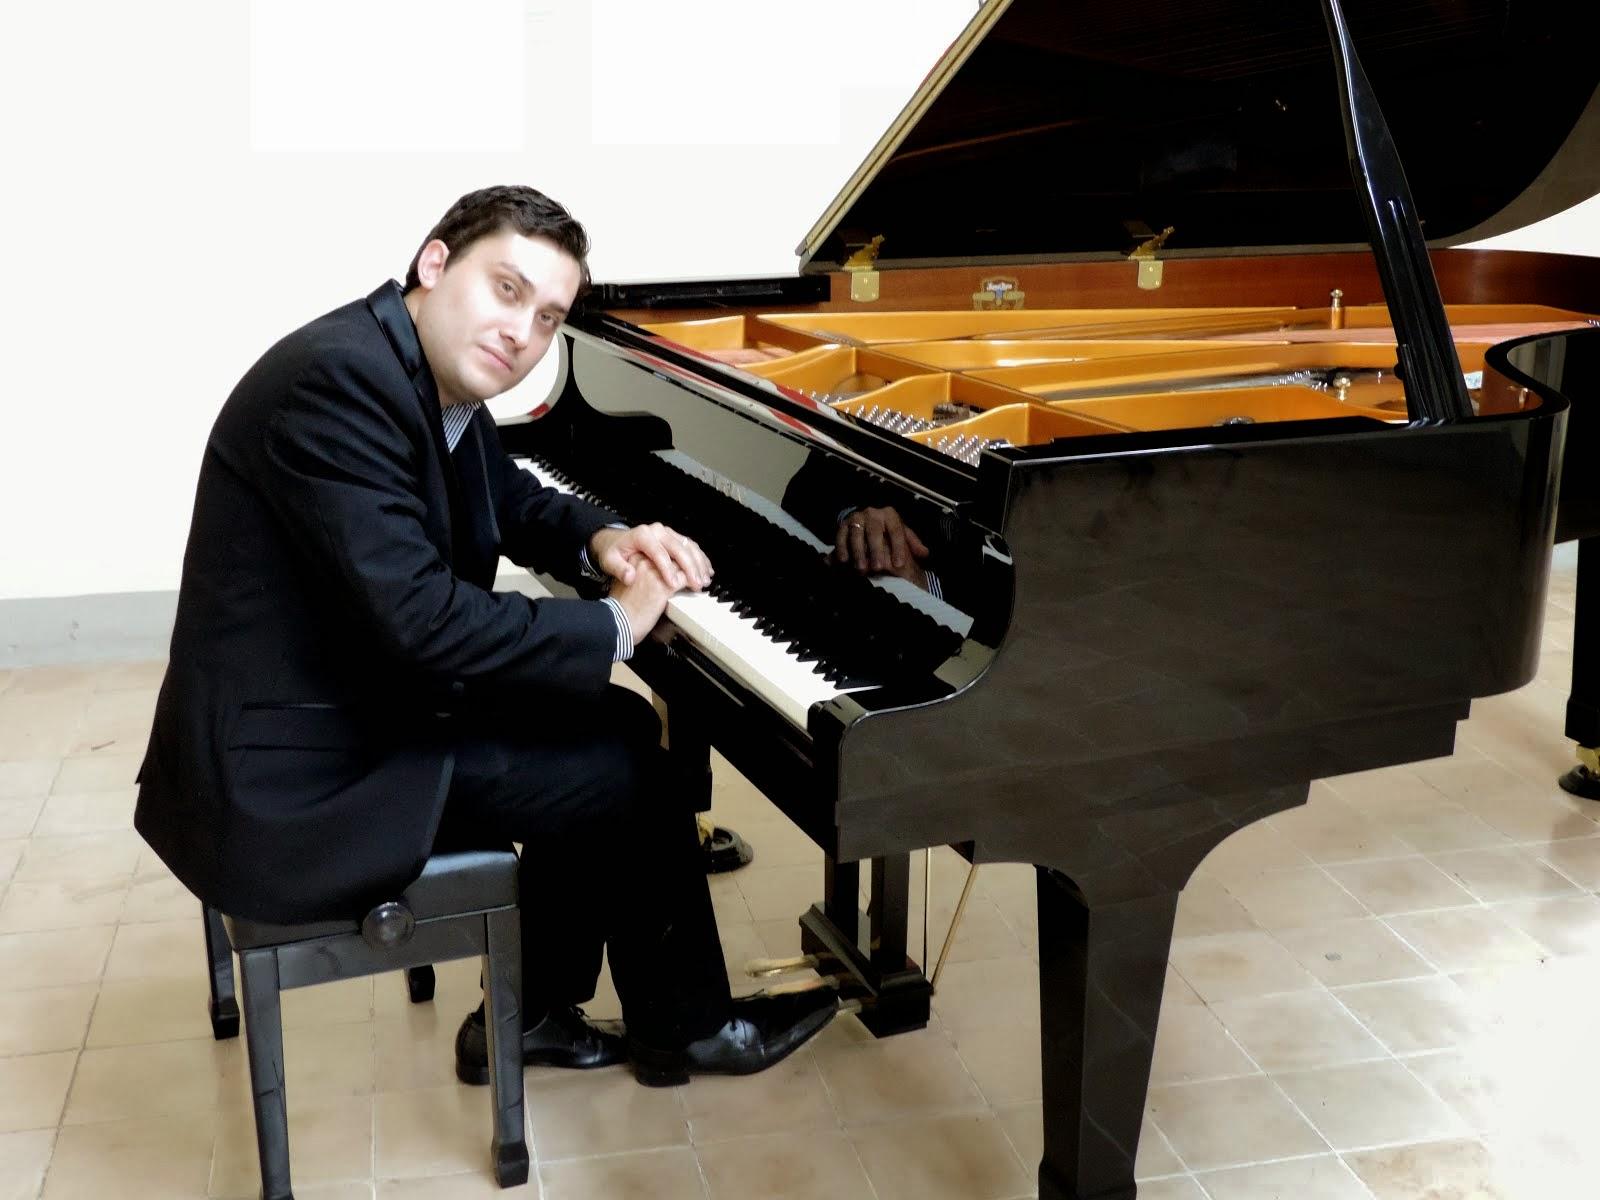 Jason Arroyo